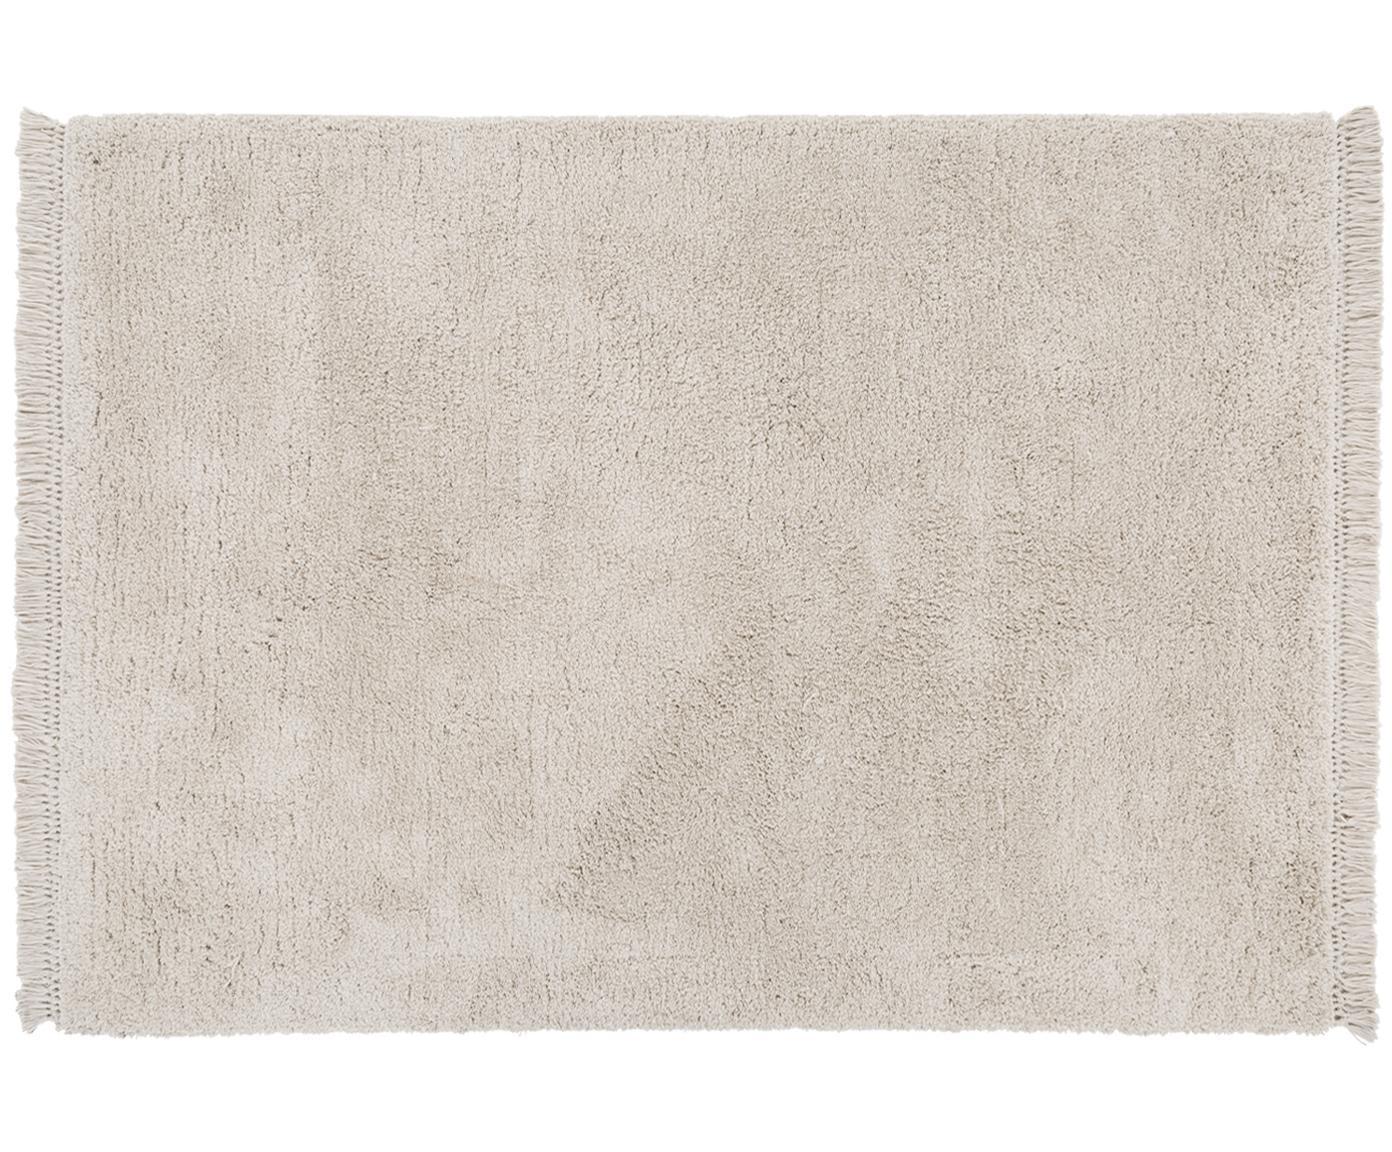 Alfombra de pelo largo con flecos Dreamy, Parte superior: 100%poliéster, Reverso: 100%algodón, Crema, An 120 x L 180 cm (Tamaño S)